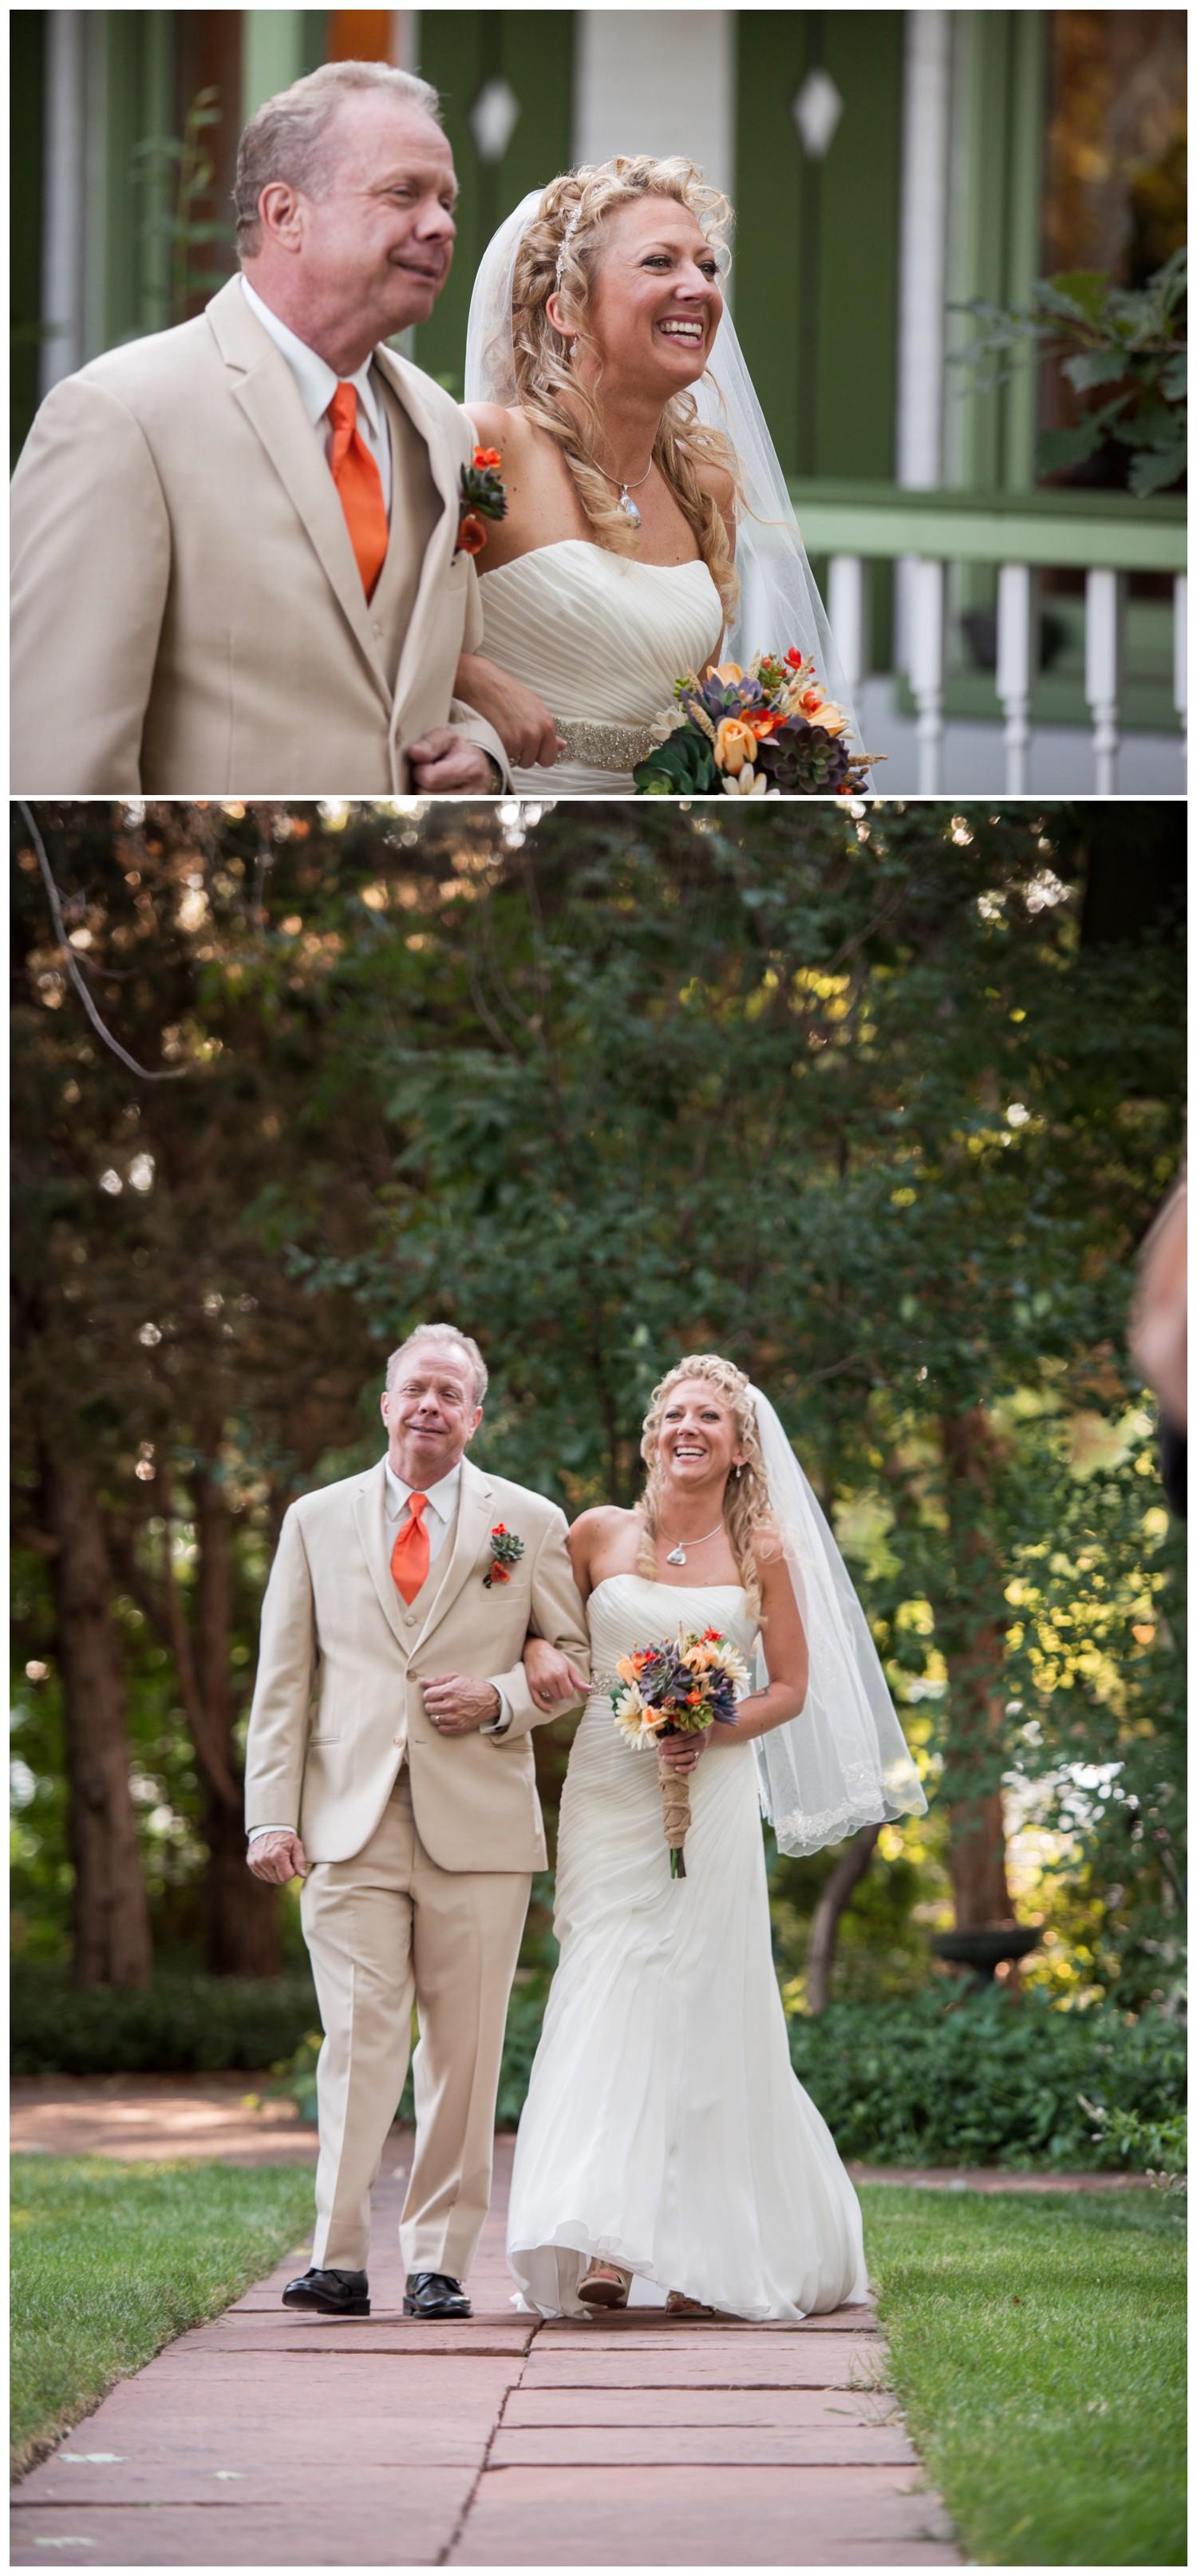 Morningside-manor-colorado-outdoor-wedding-photography_0030.jpg